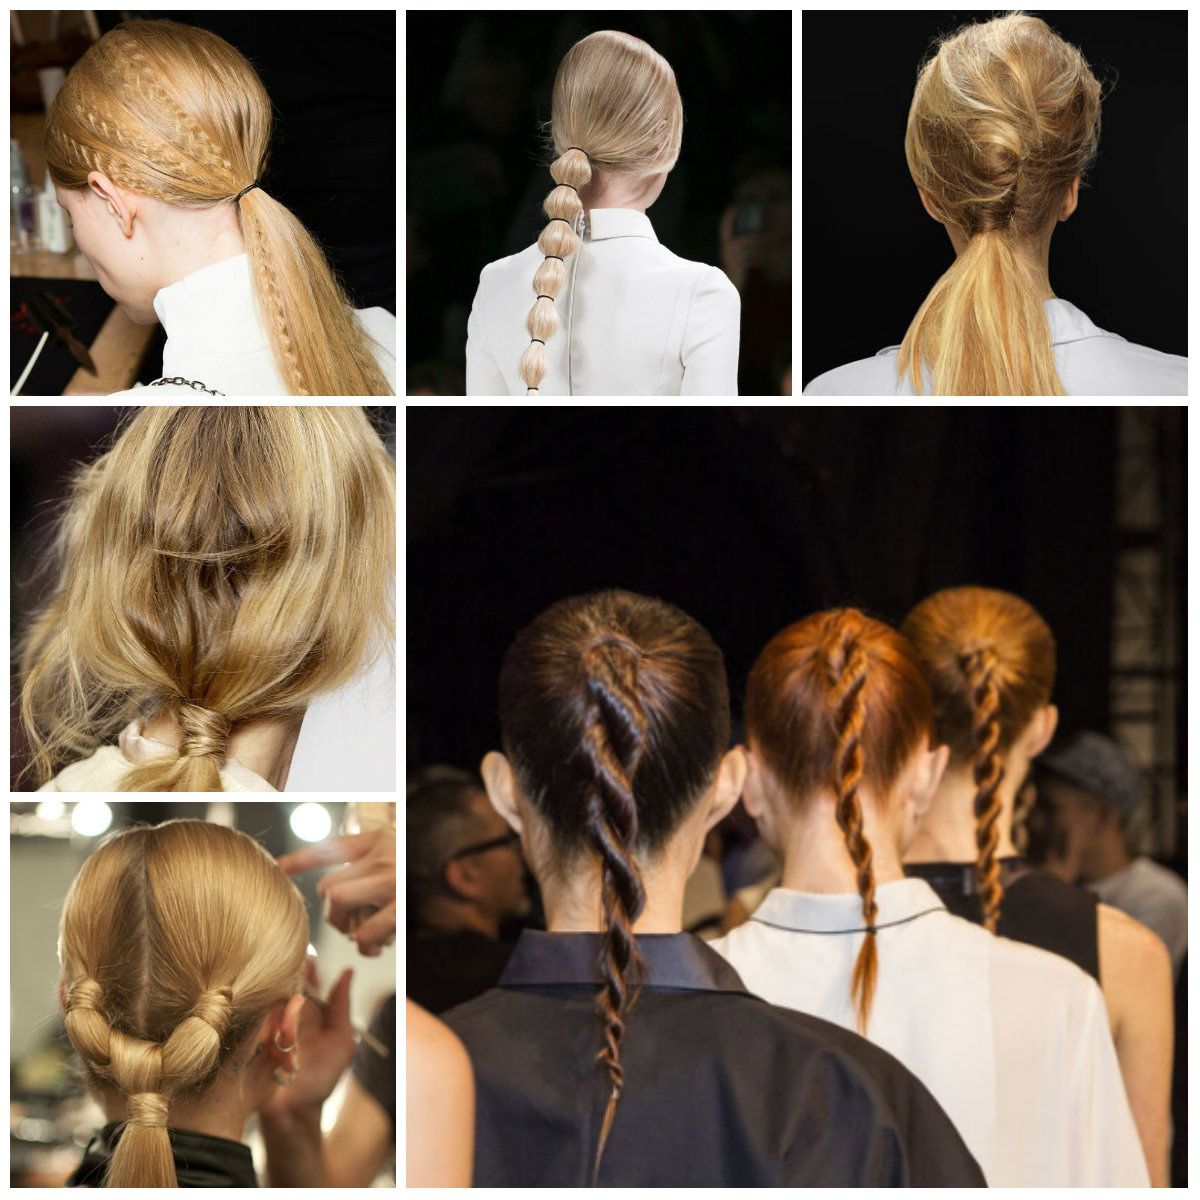 ponytail hairstyles 2022